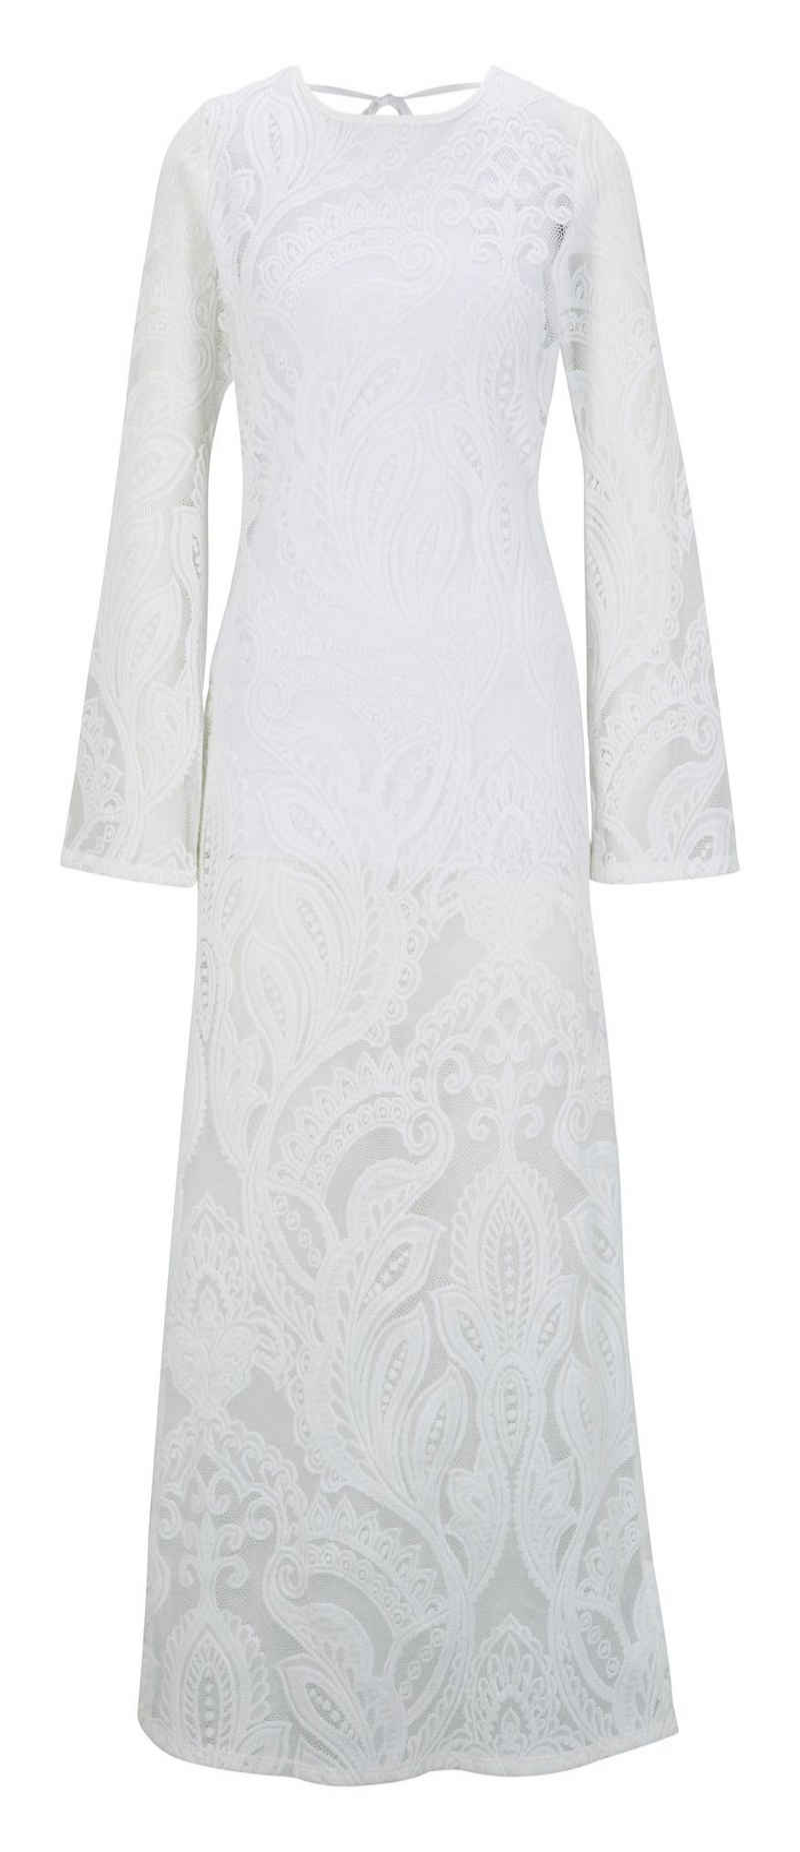 LINEA TESINI by Heine Spitzenkleid »Spitzen-Kleid«